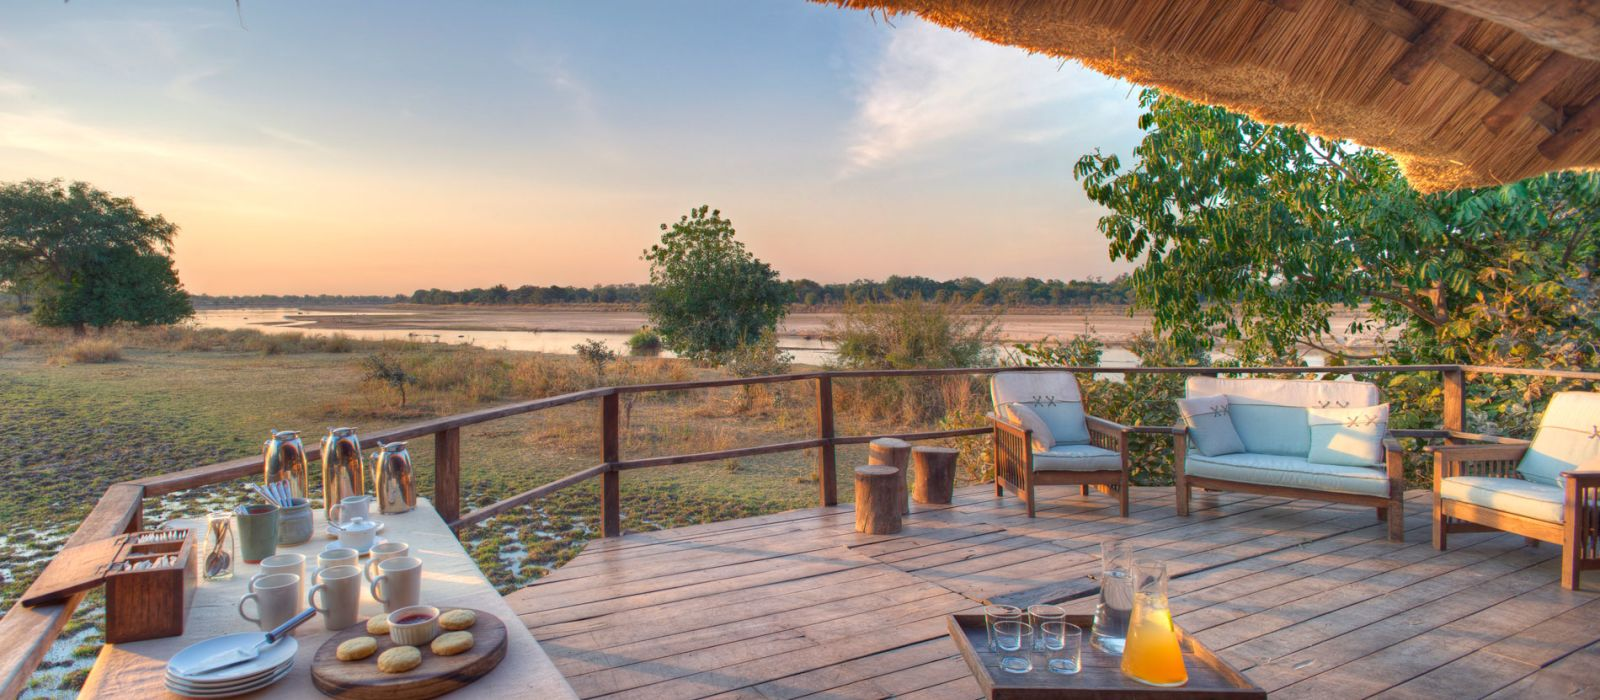 Hotel Kakuli Bush Camp Zambia